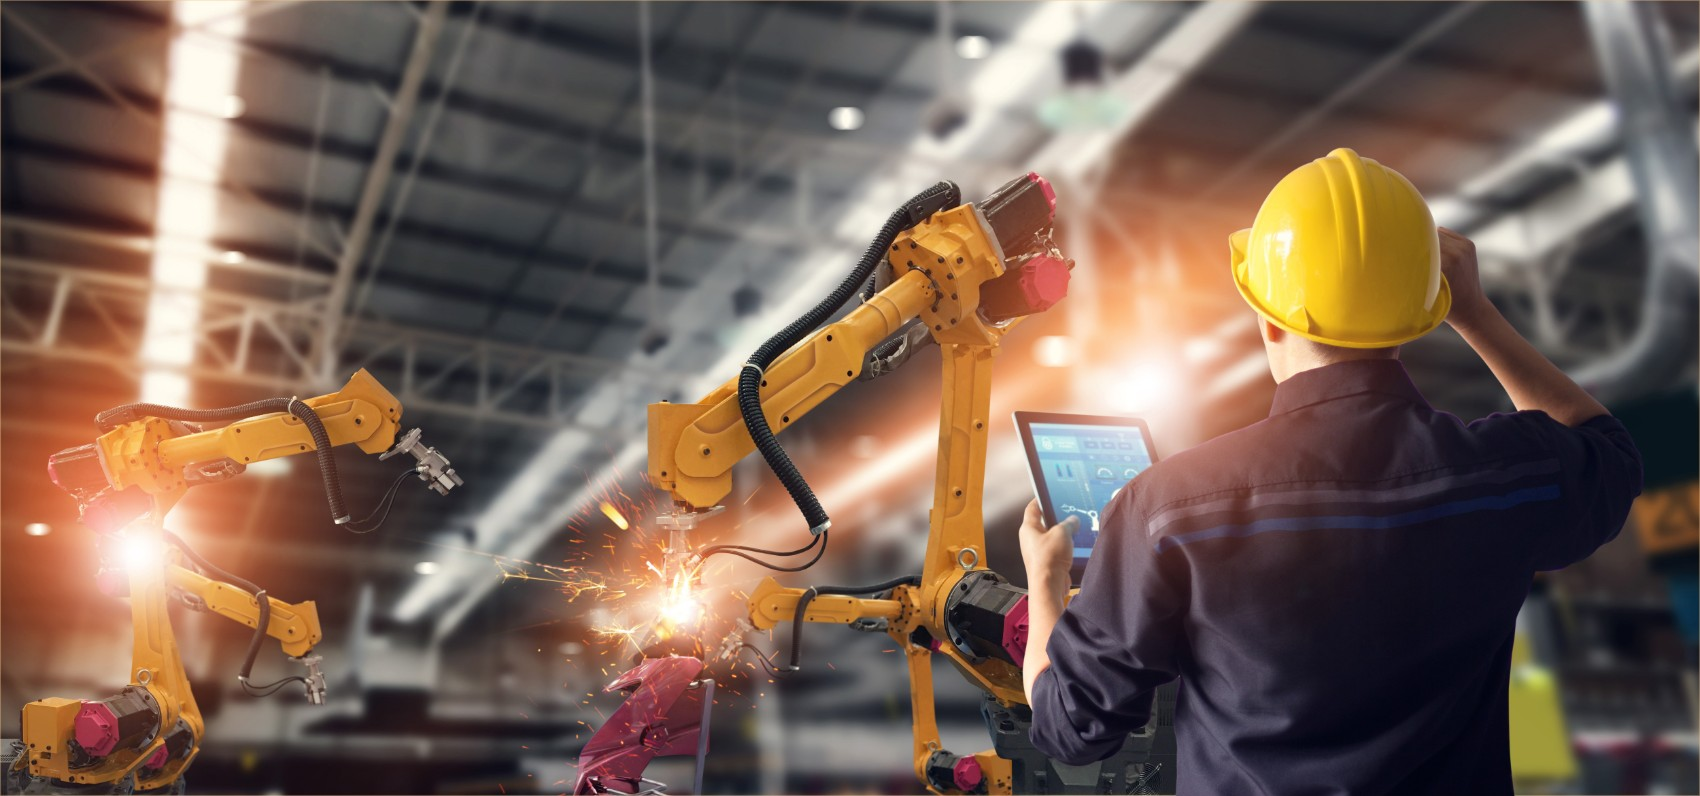 Discrete Manufacturing Equipment in Factory